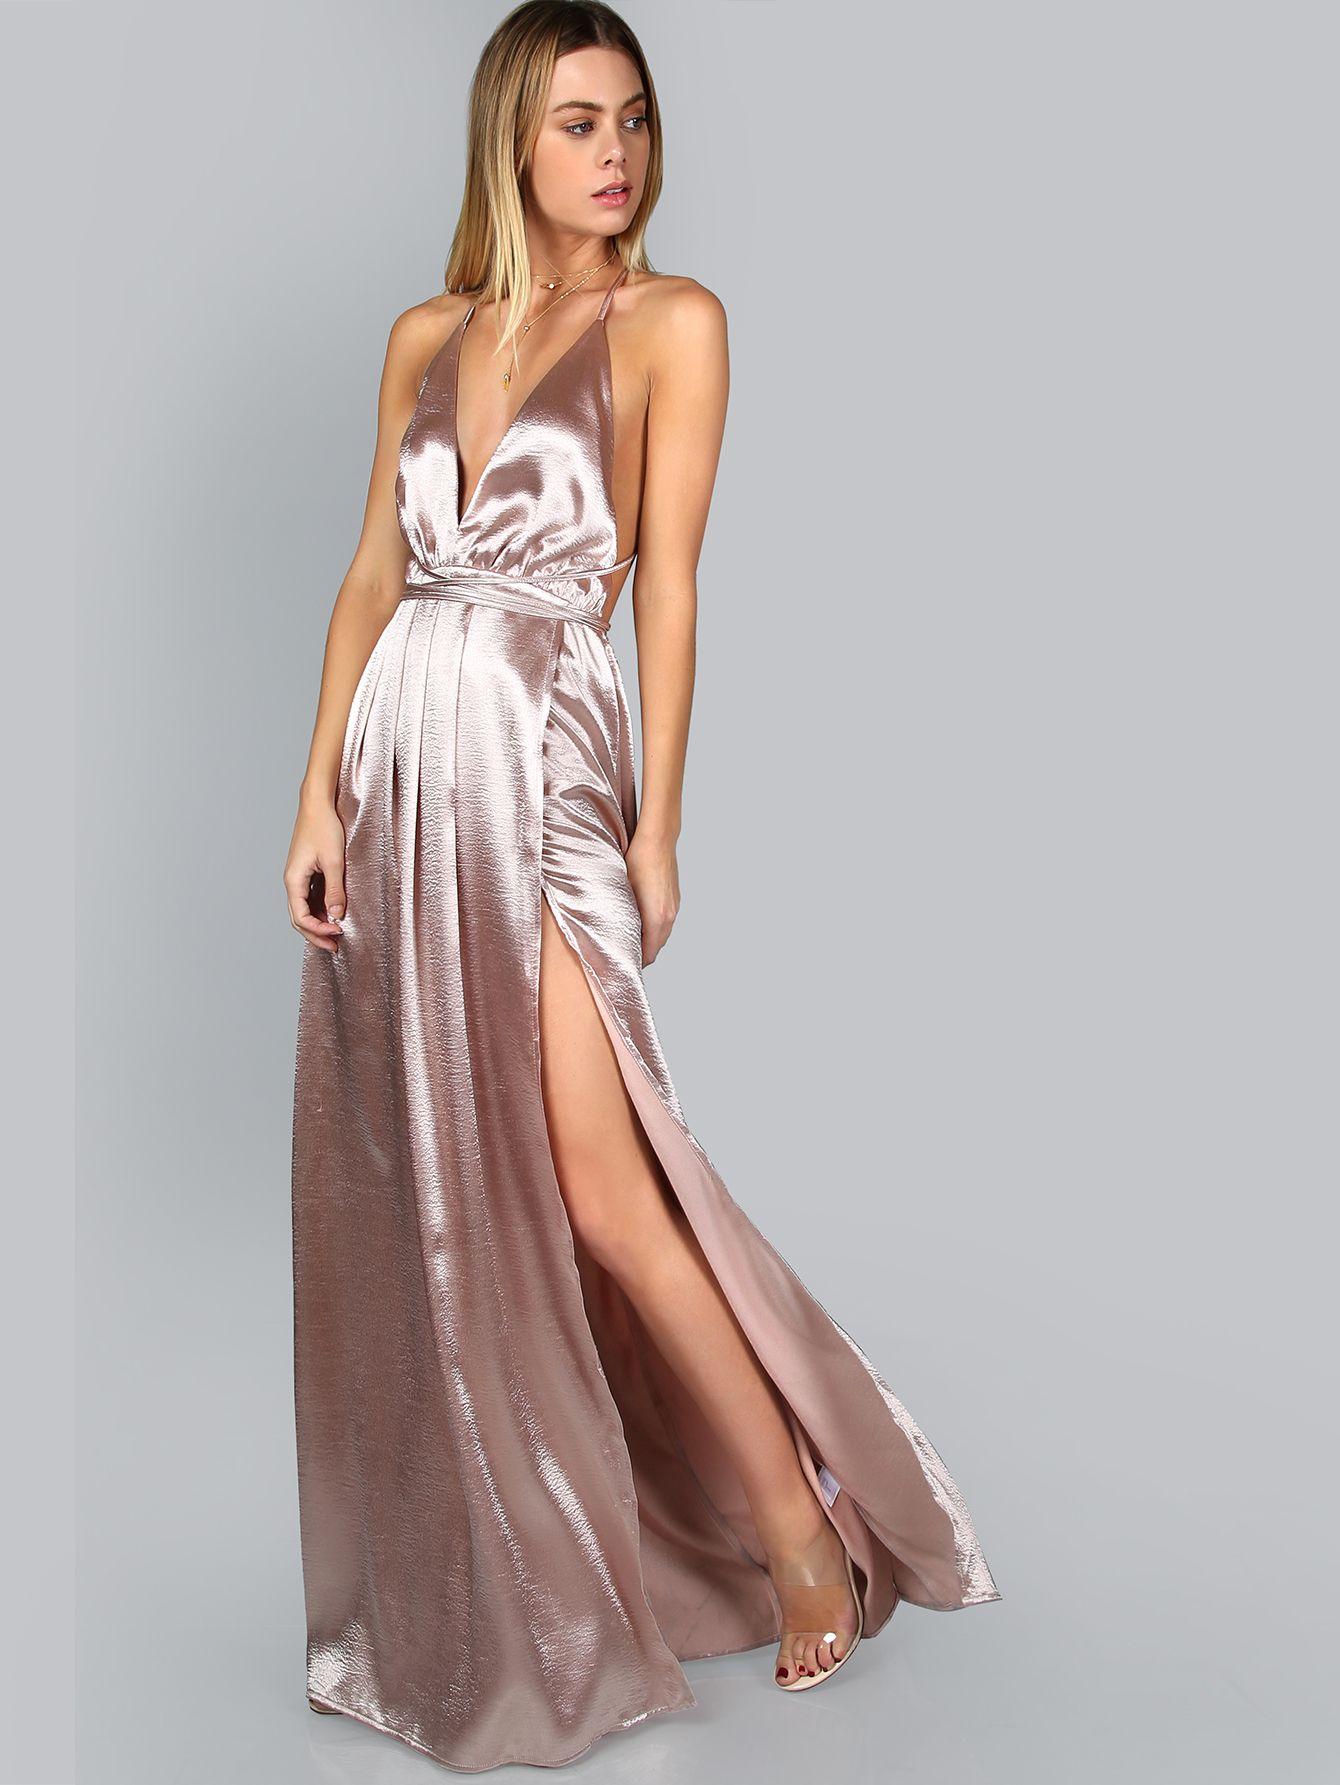 36042d05b63 Pink Plunge Neck Crisscross Back High Slit Wrap Cami Dress